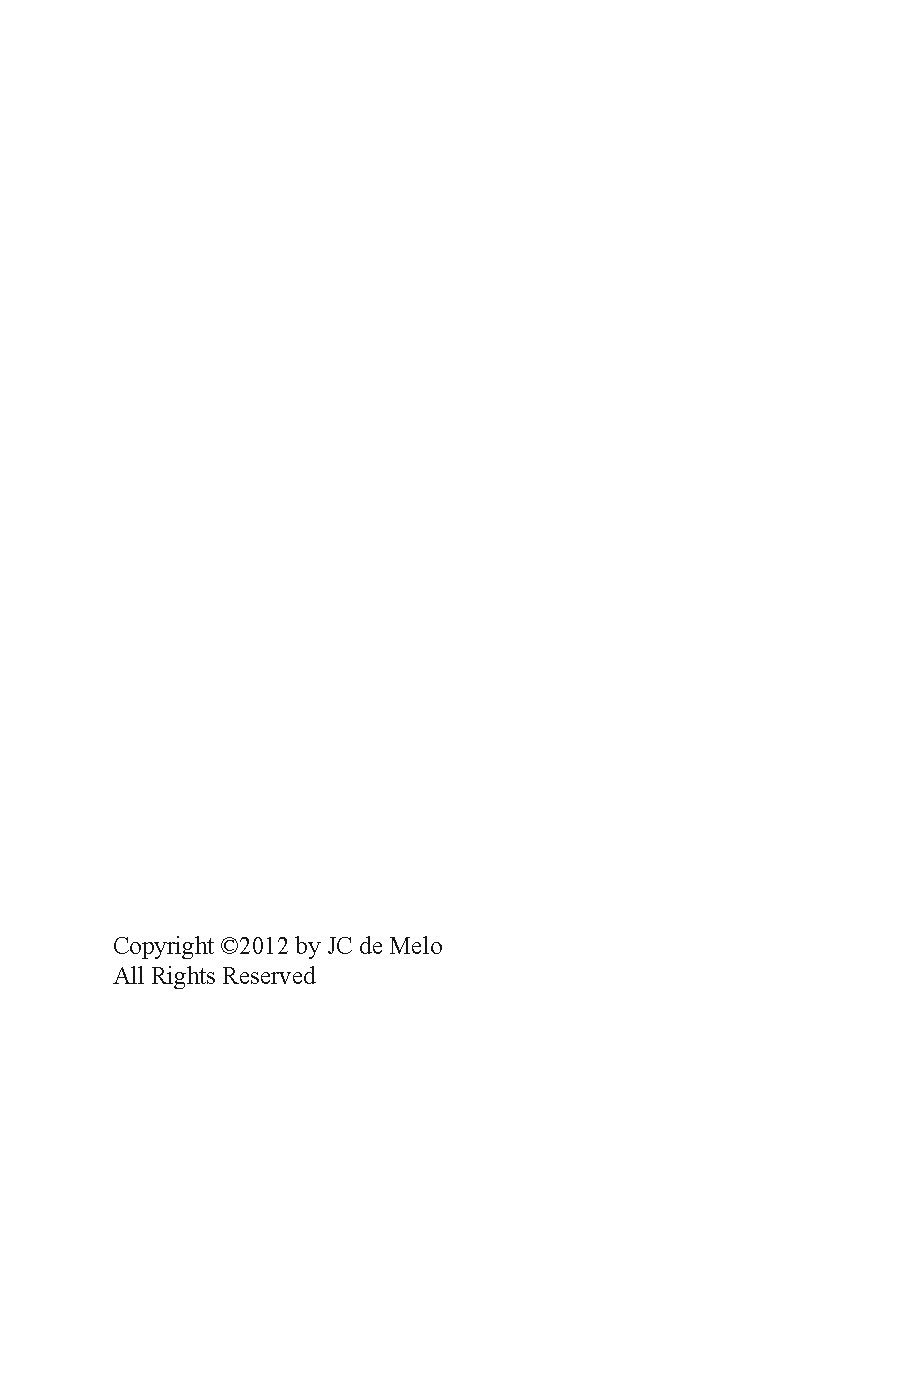 binder6_page_03.jpg